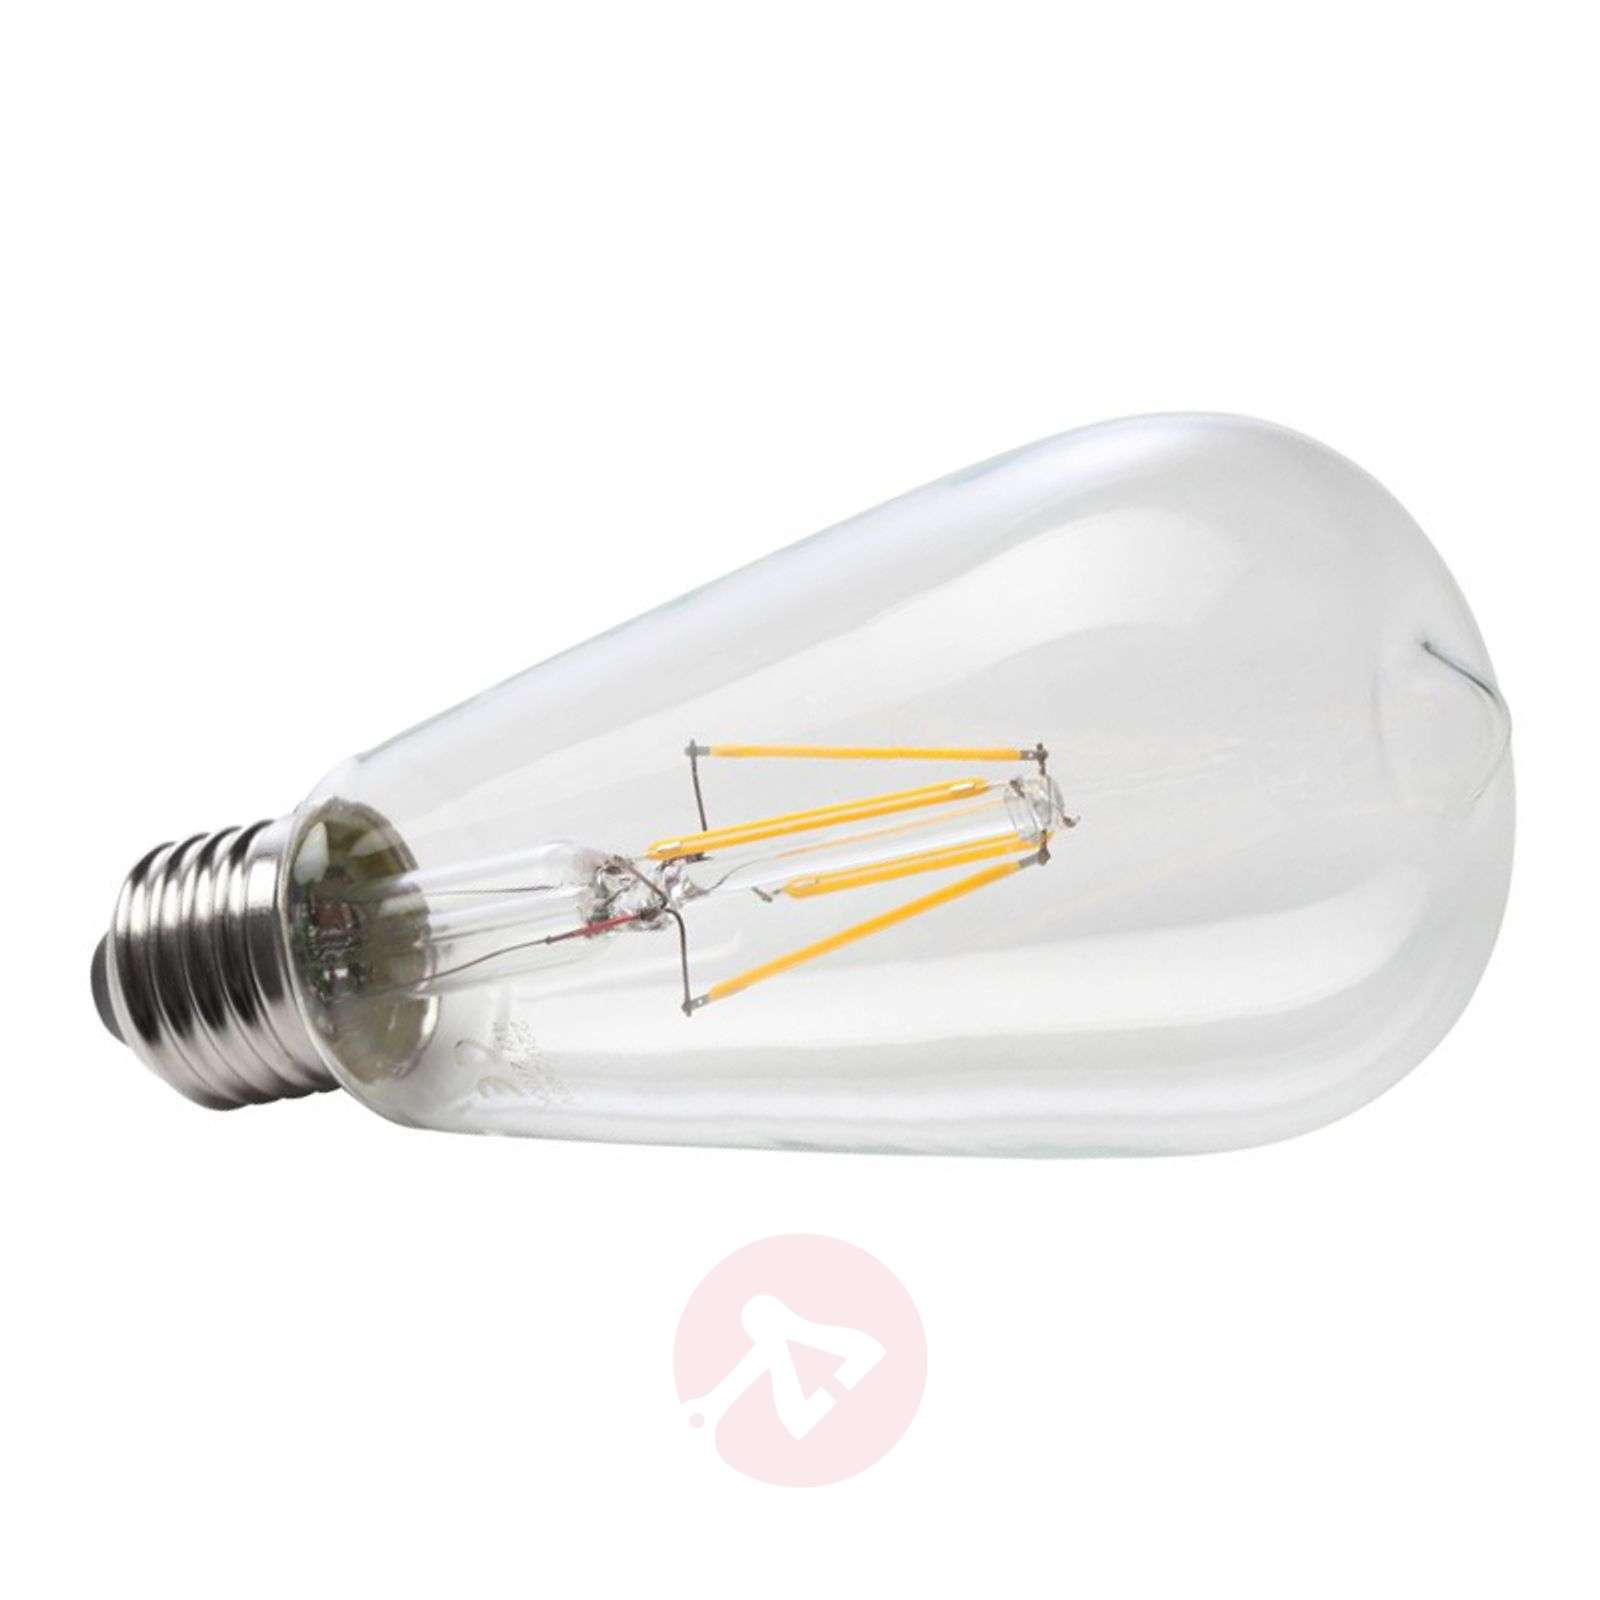 E27 6W 827 LED rustical filament bulb-6520240-01